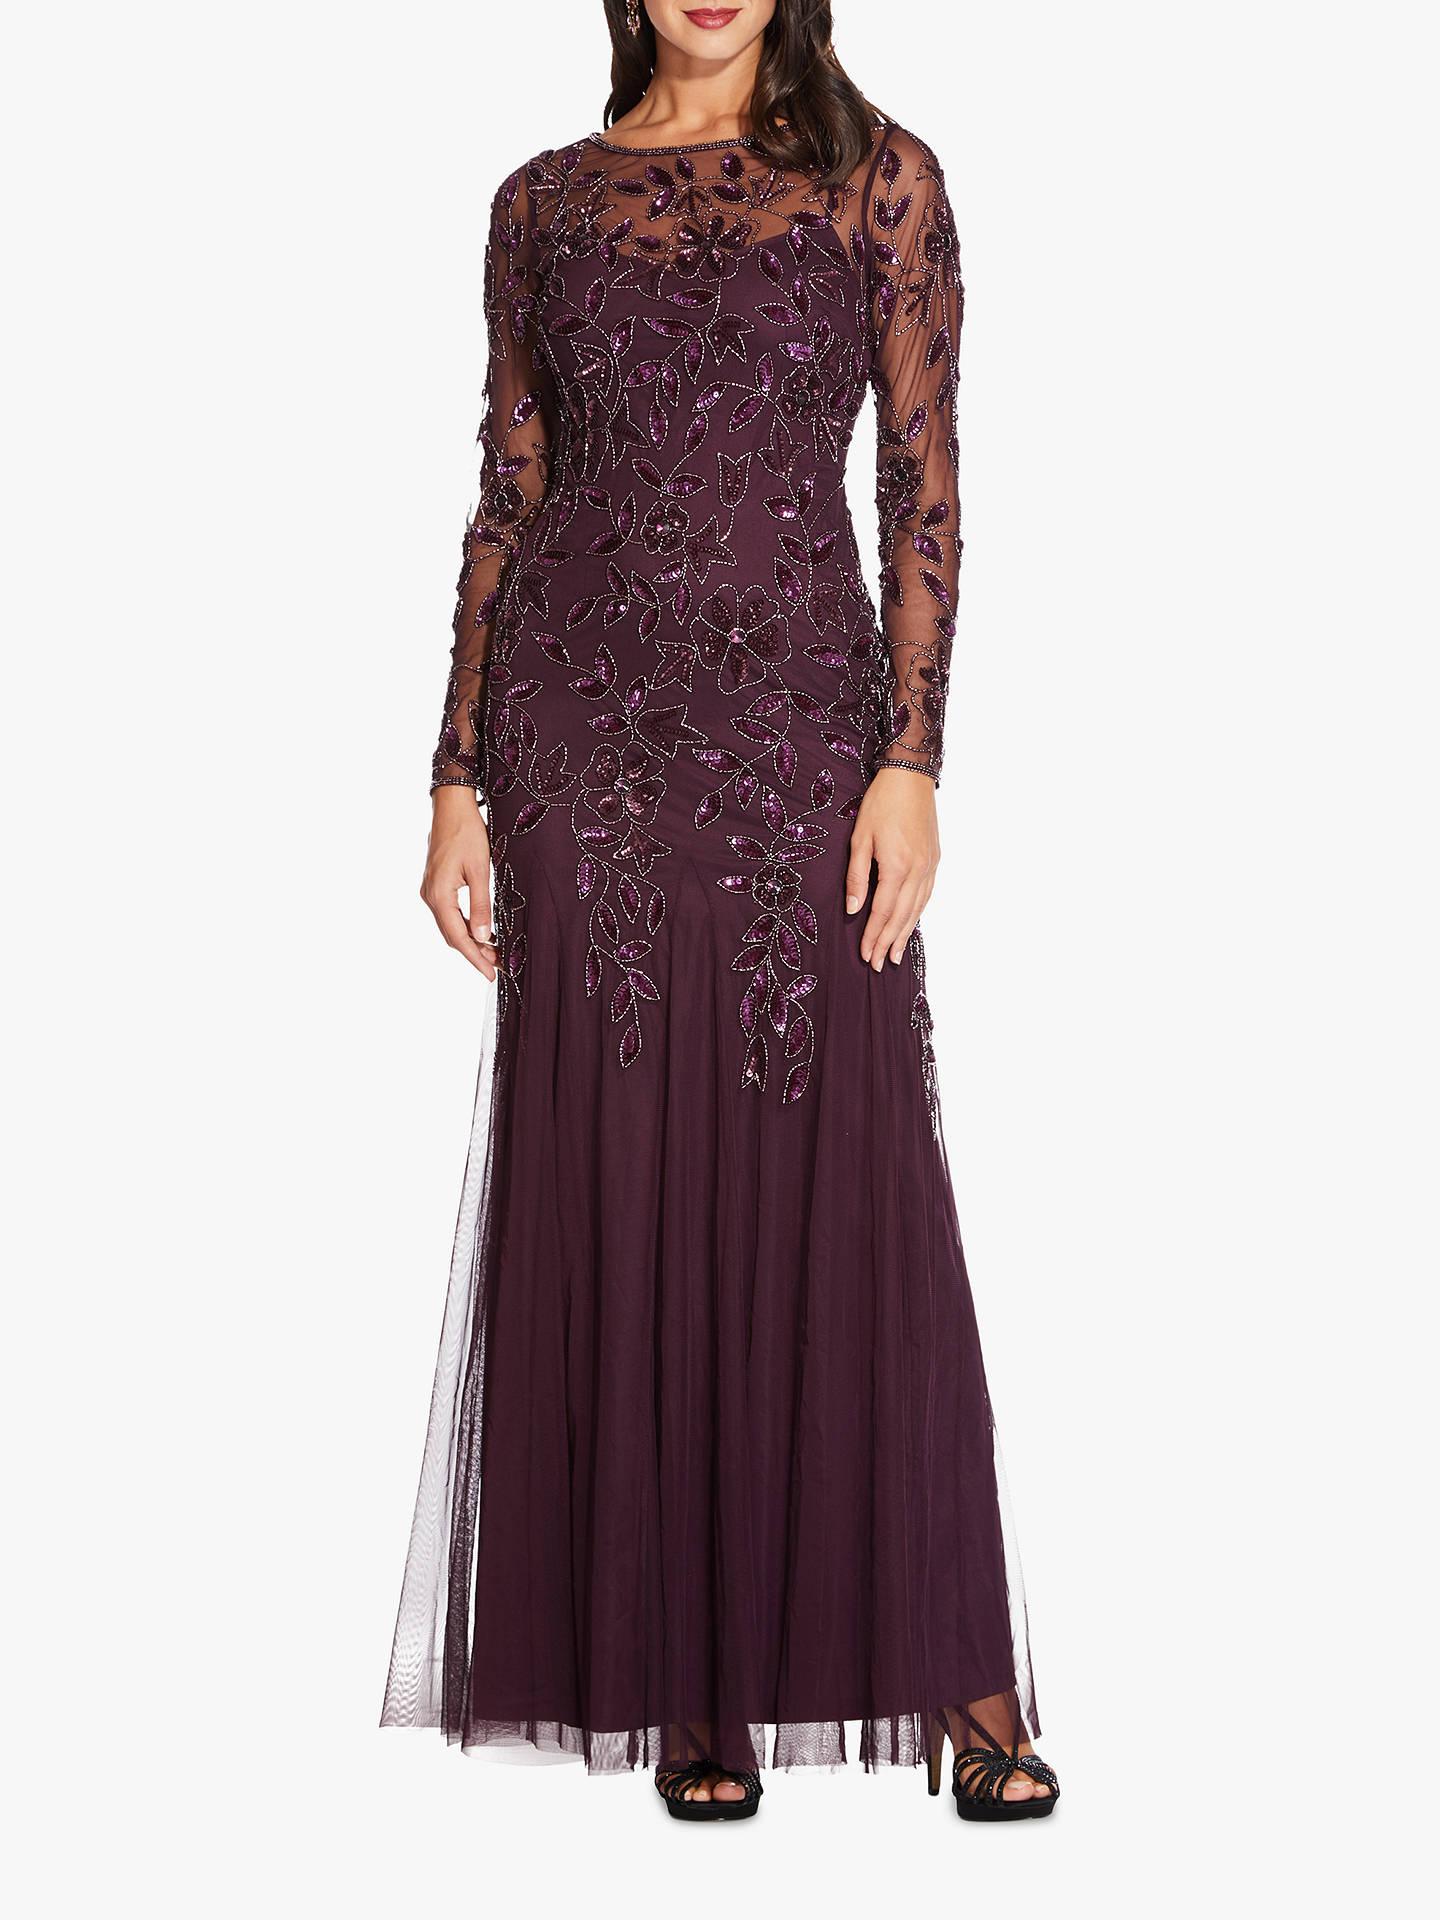 4c2ee363 Adrianna Papell Beaded Long Leaf Dress, Night Plum at John Lewis ...